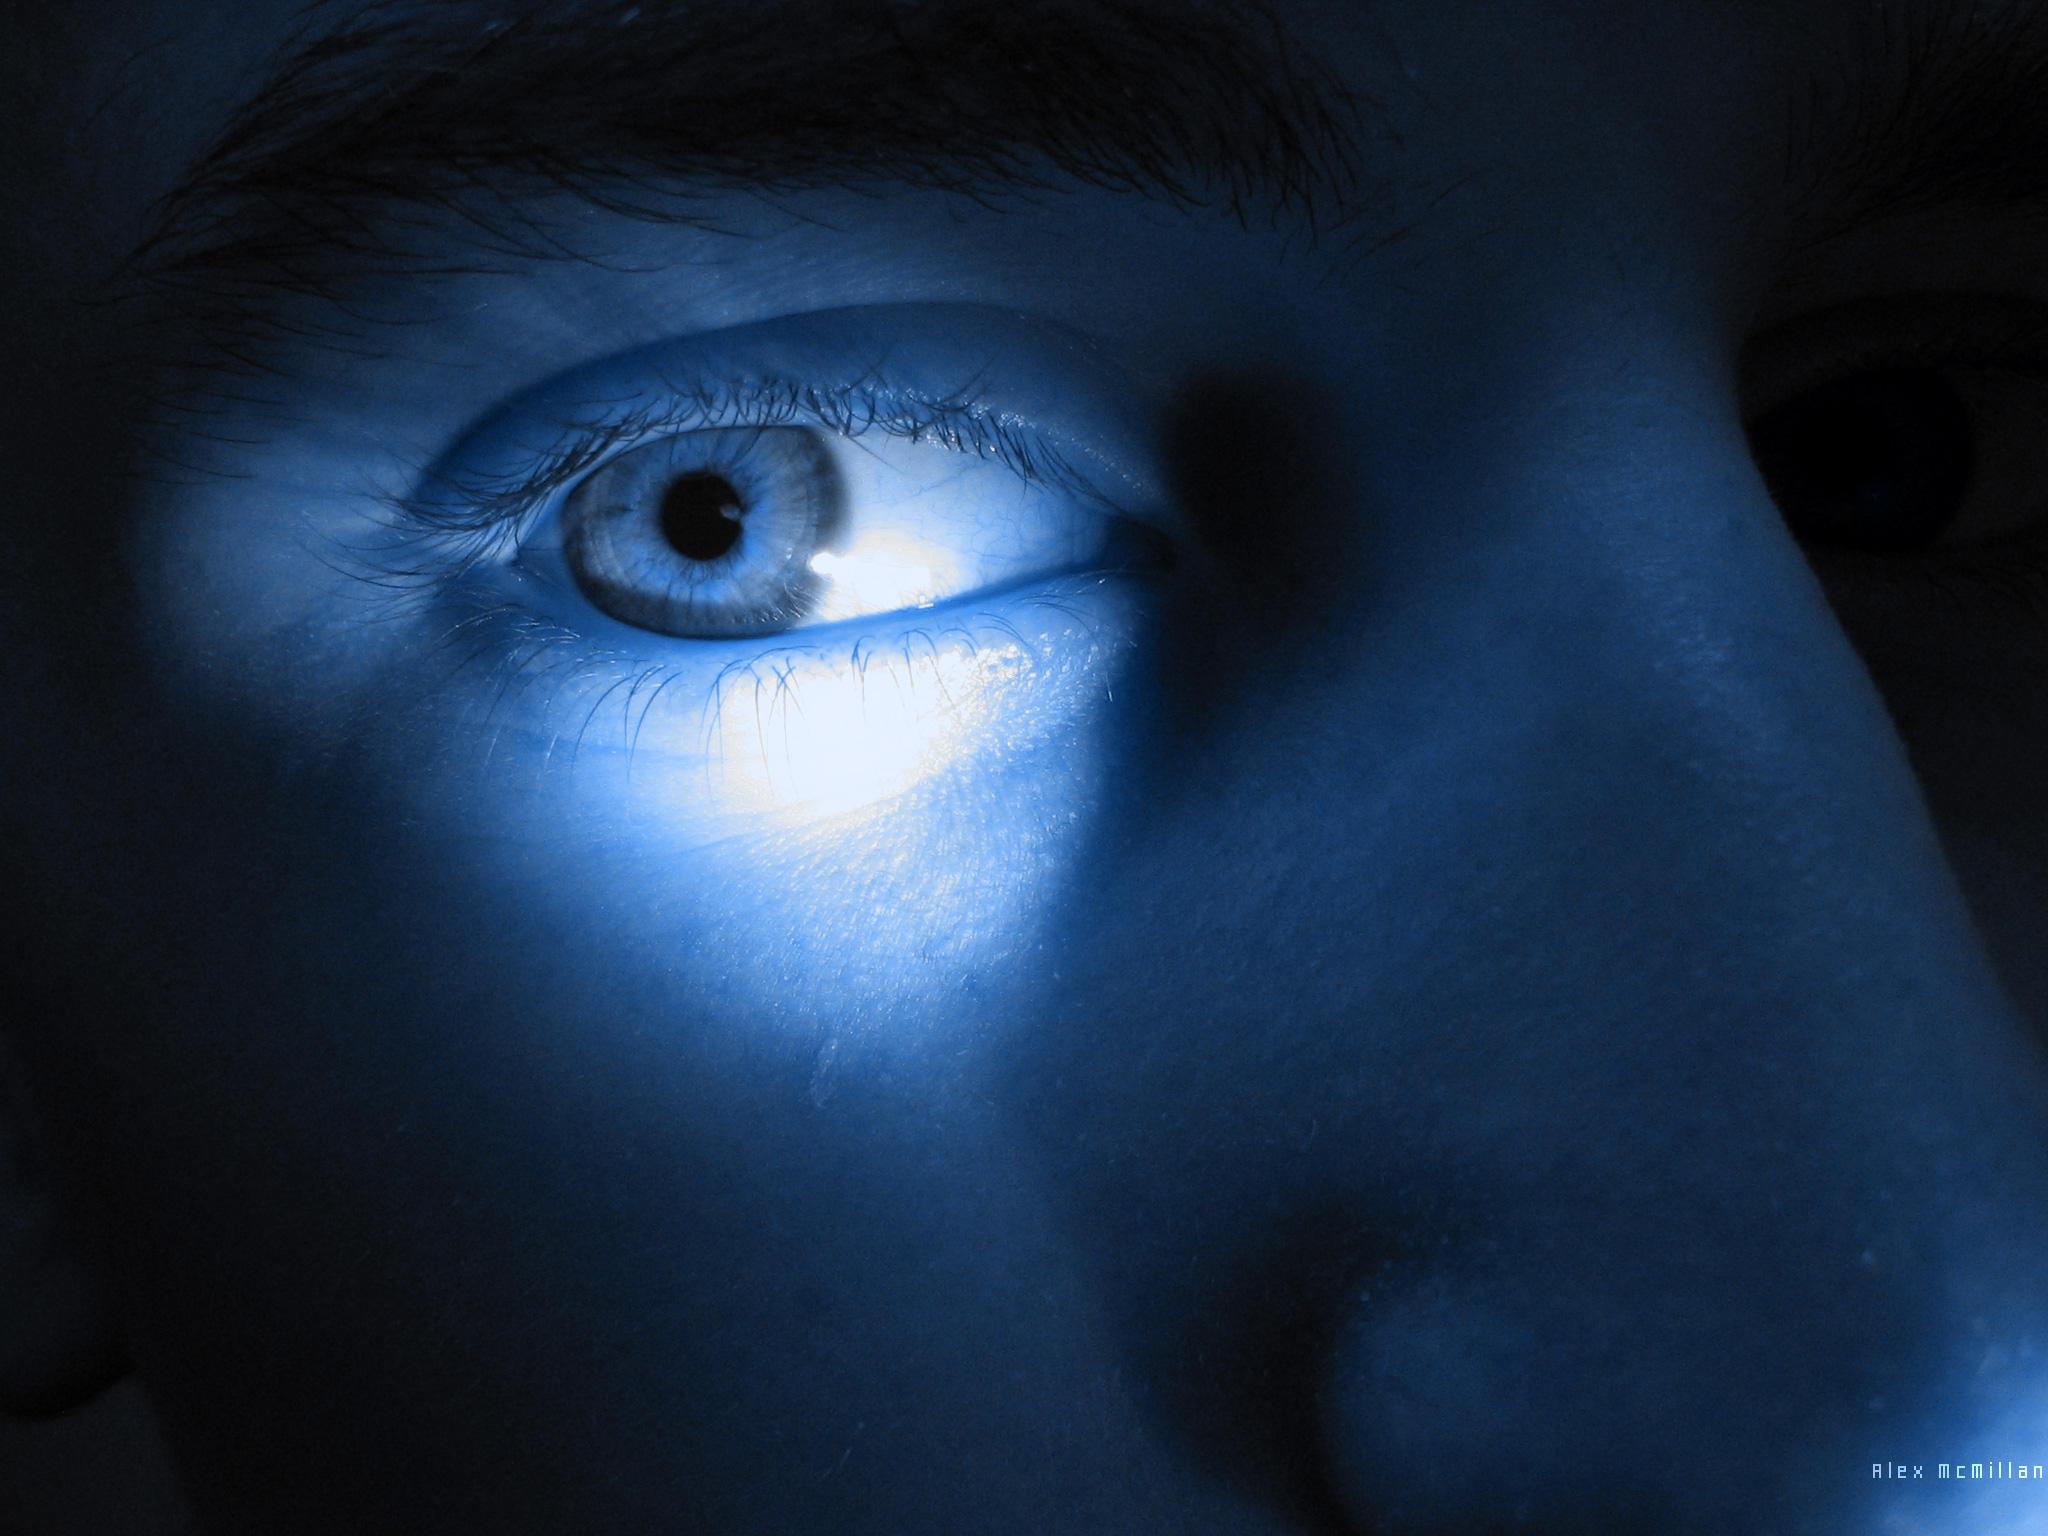 Disjointed Eye Spy Wallpaper By